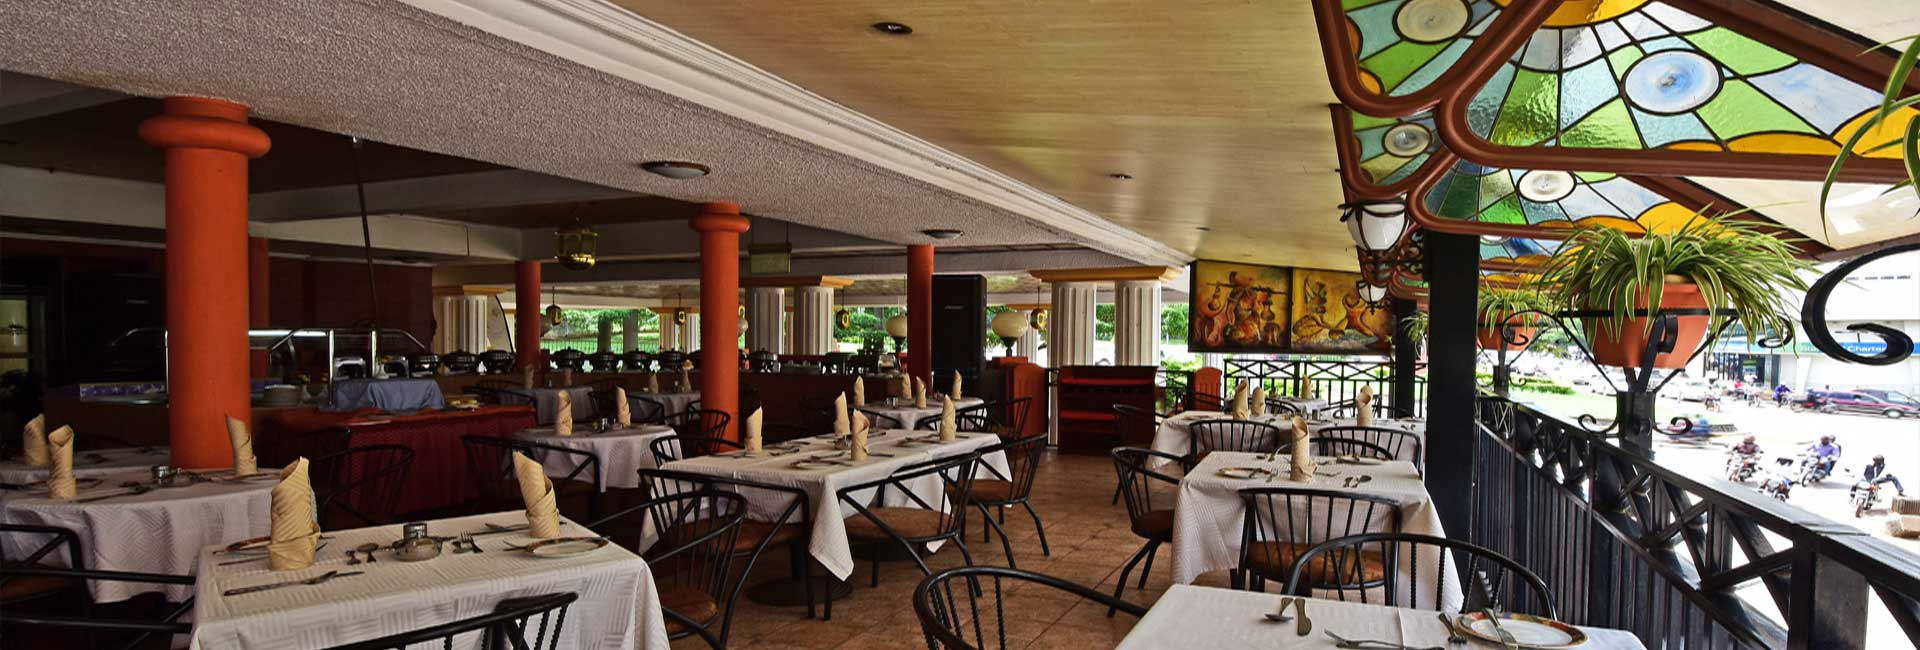 Imperial Group Of Hotels Kampala Uganda